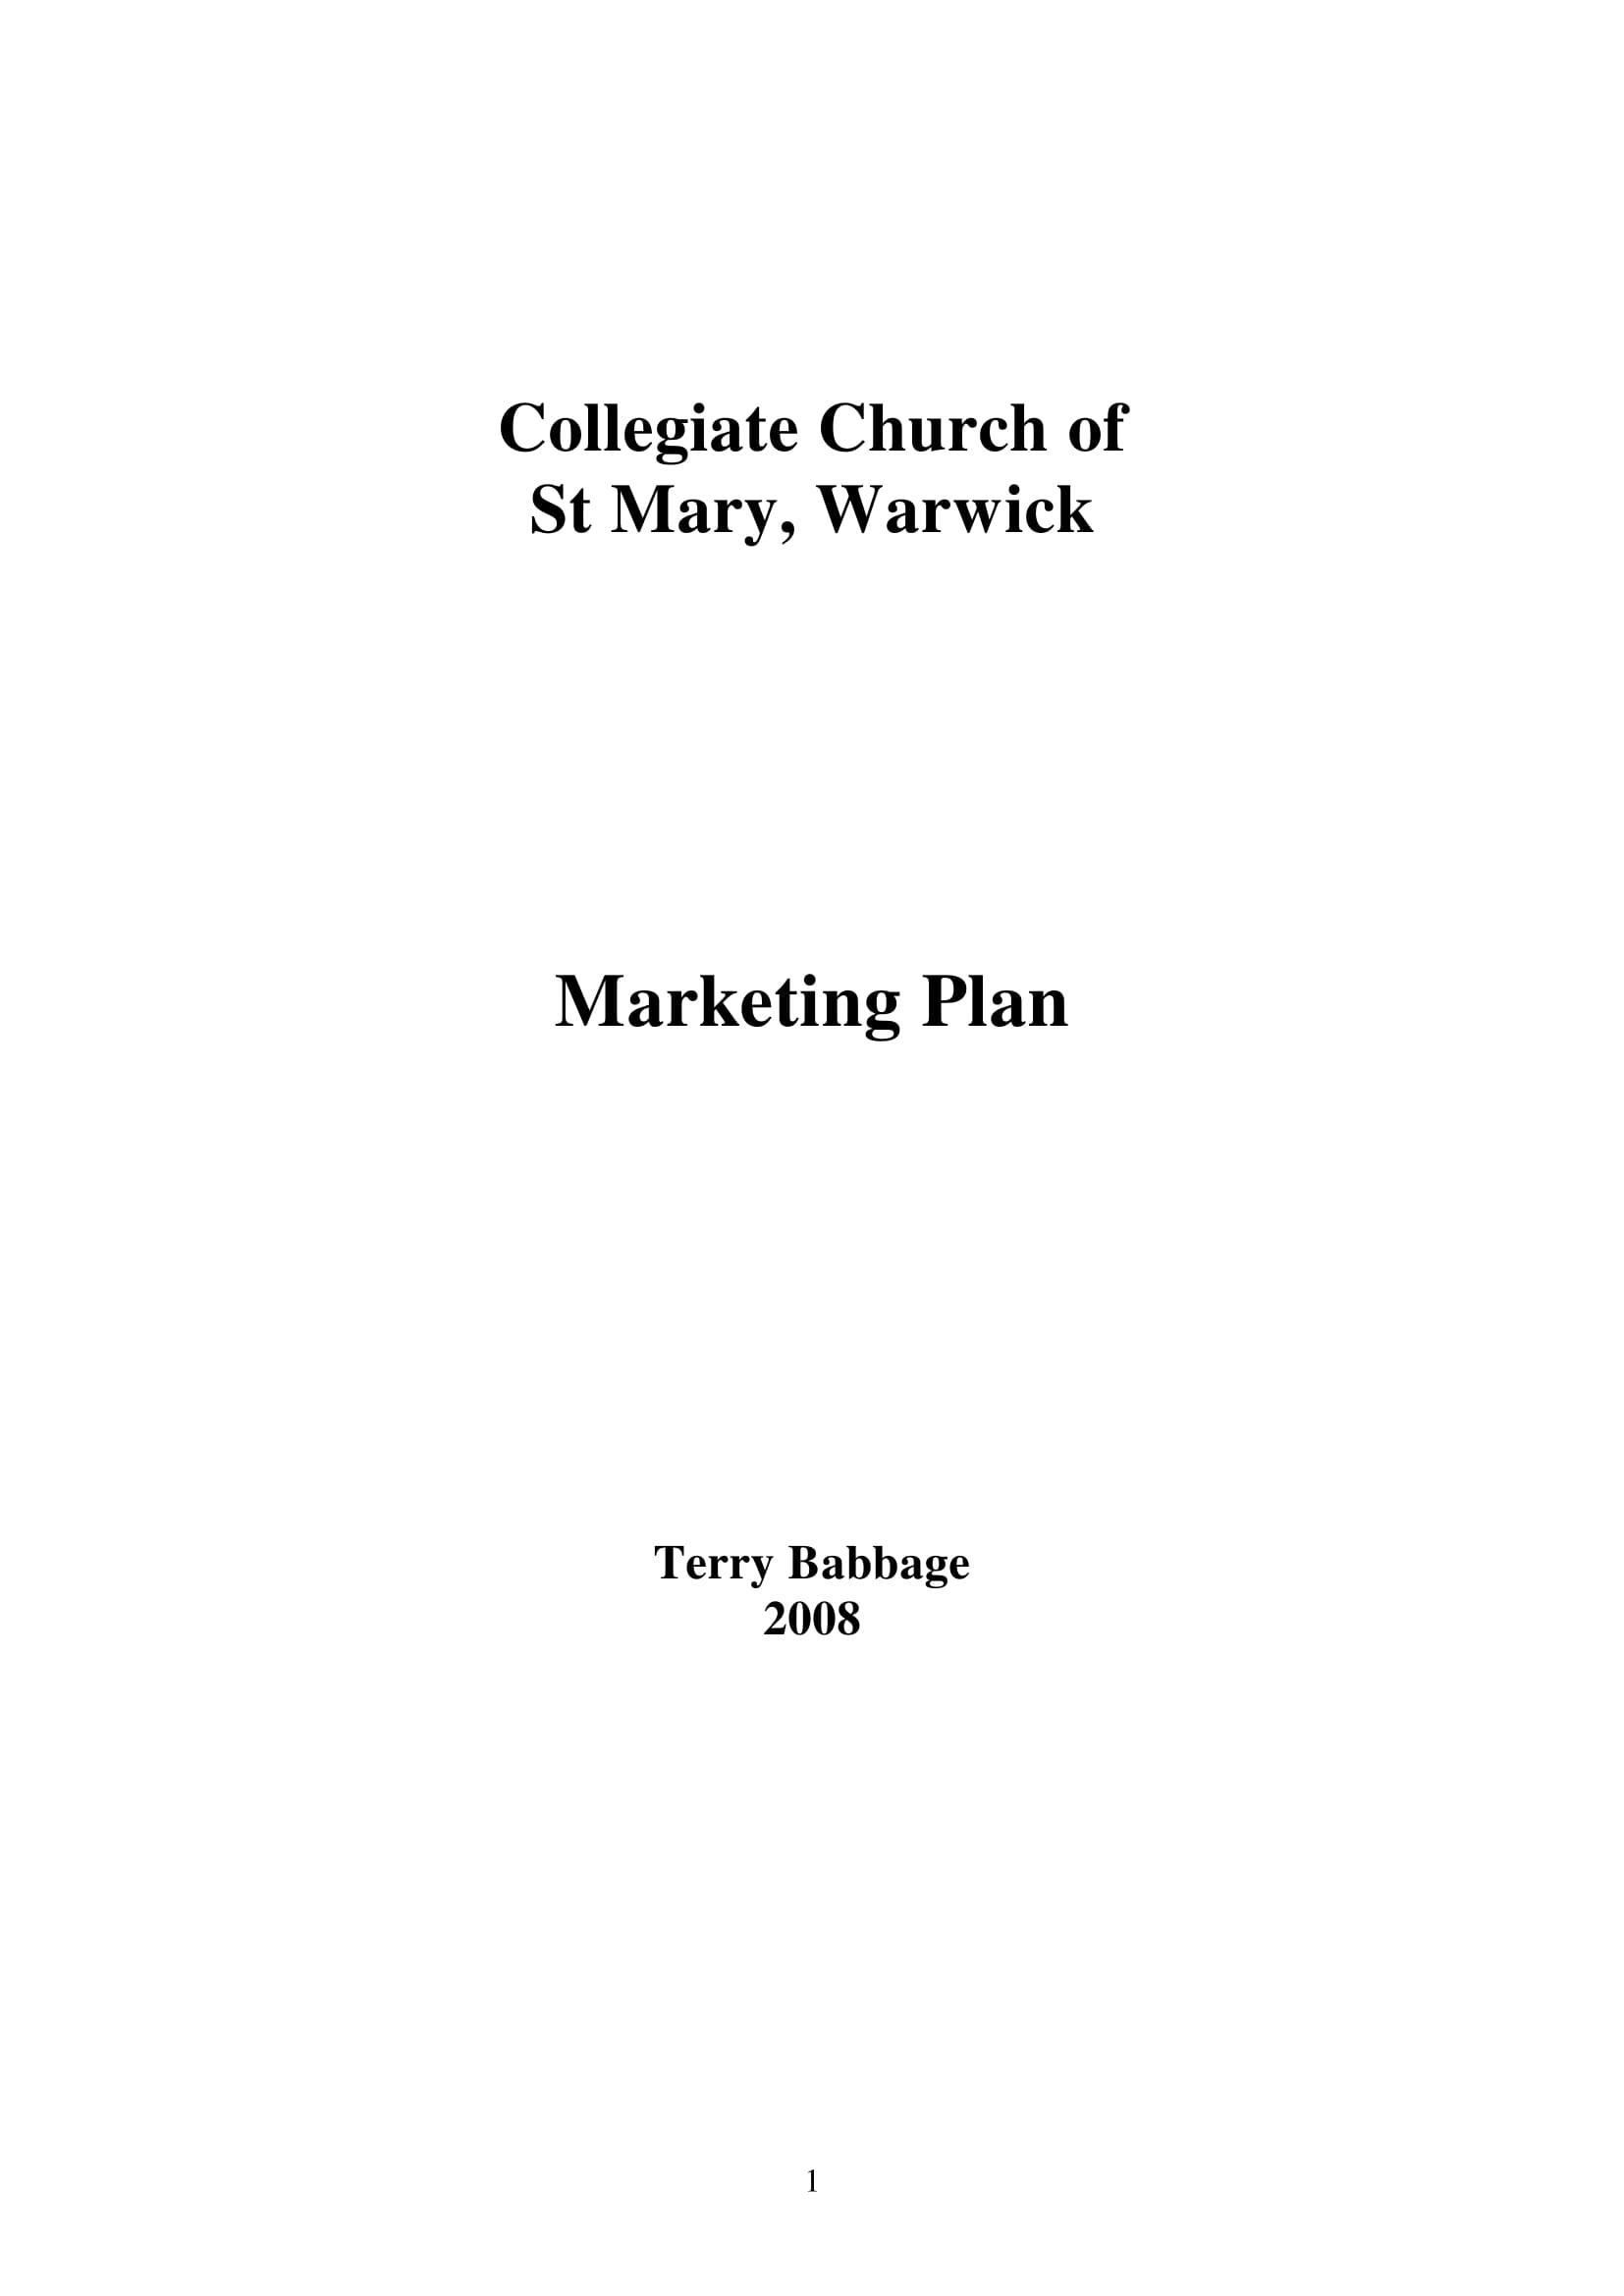 collegiate church marketing plan example 01